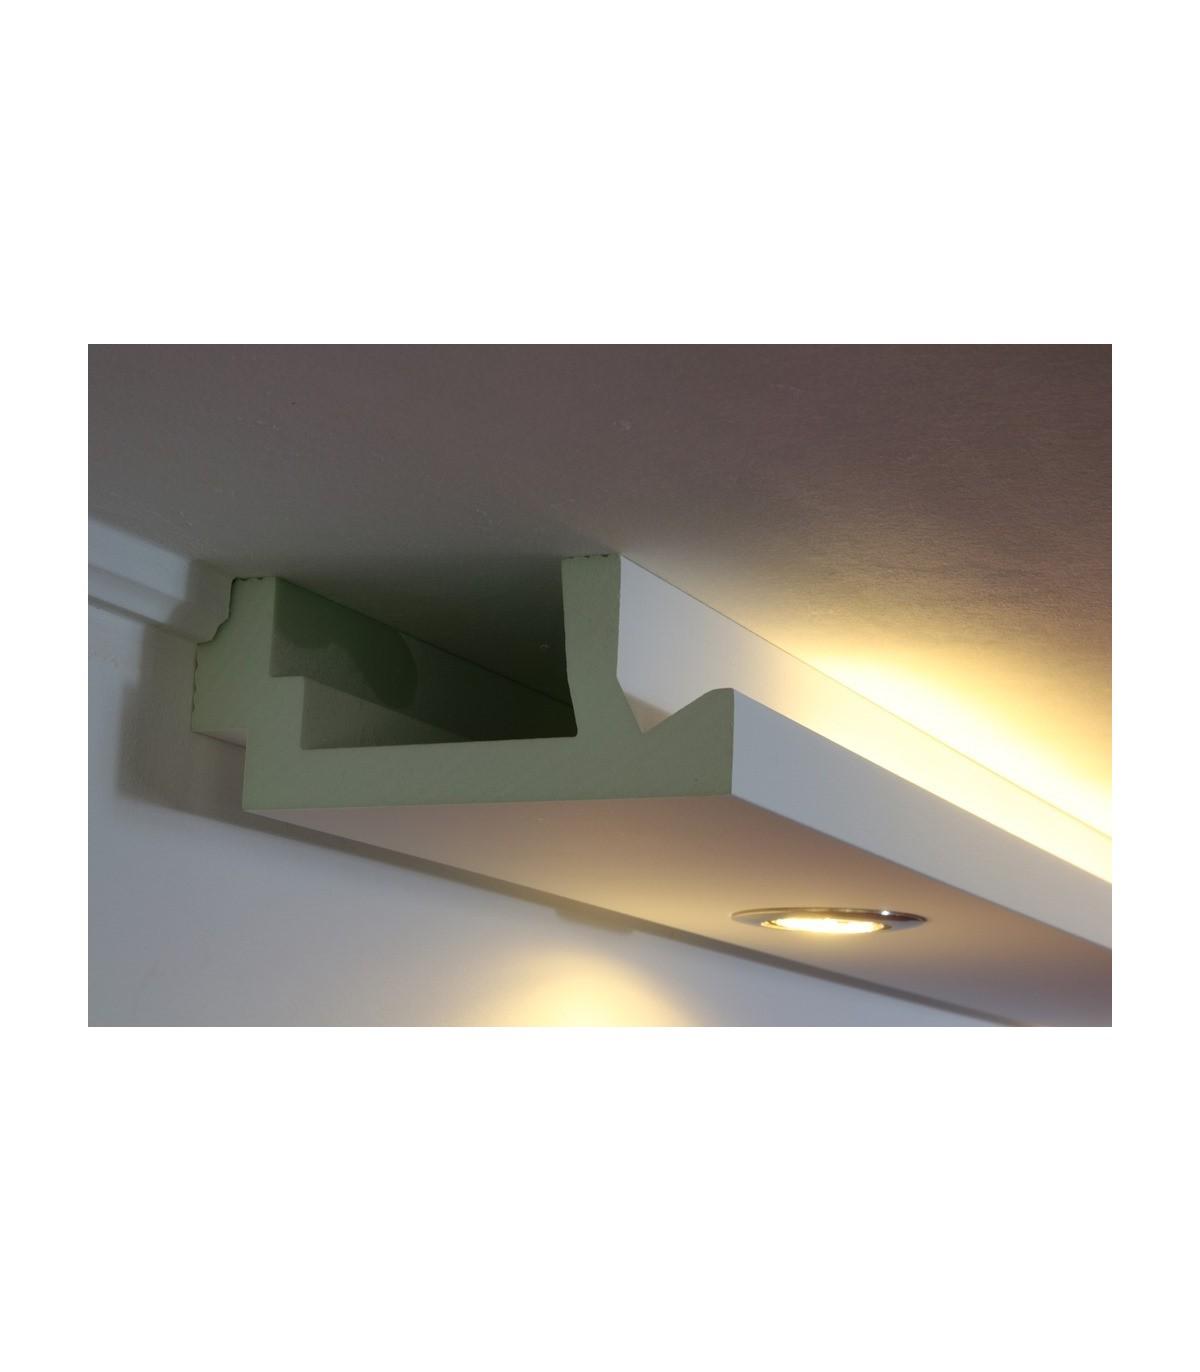 stuckprofil wdml 200a pr f r indirekte beleuchtung wand. Black Bedroom Furniture Sets. Home Design Ideas